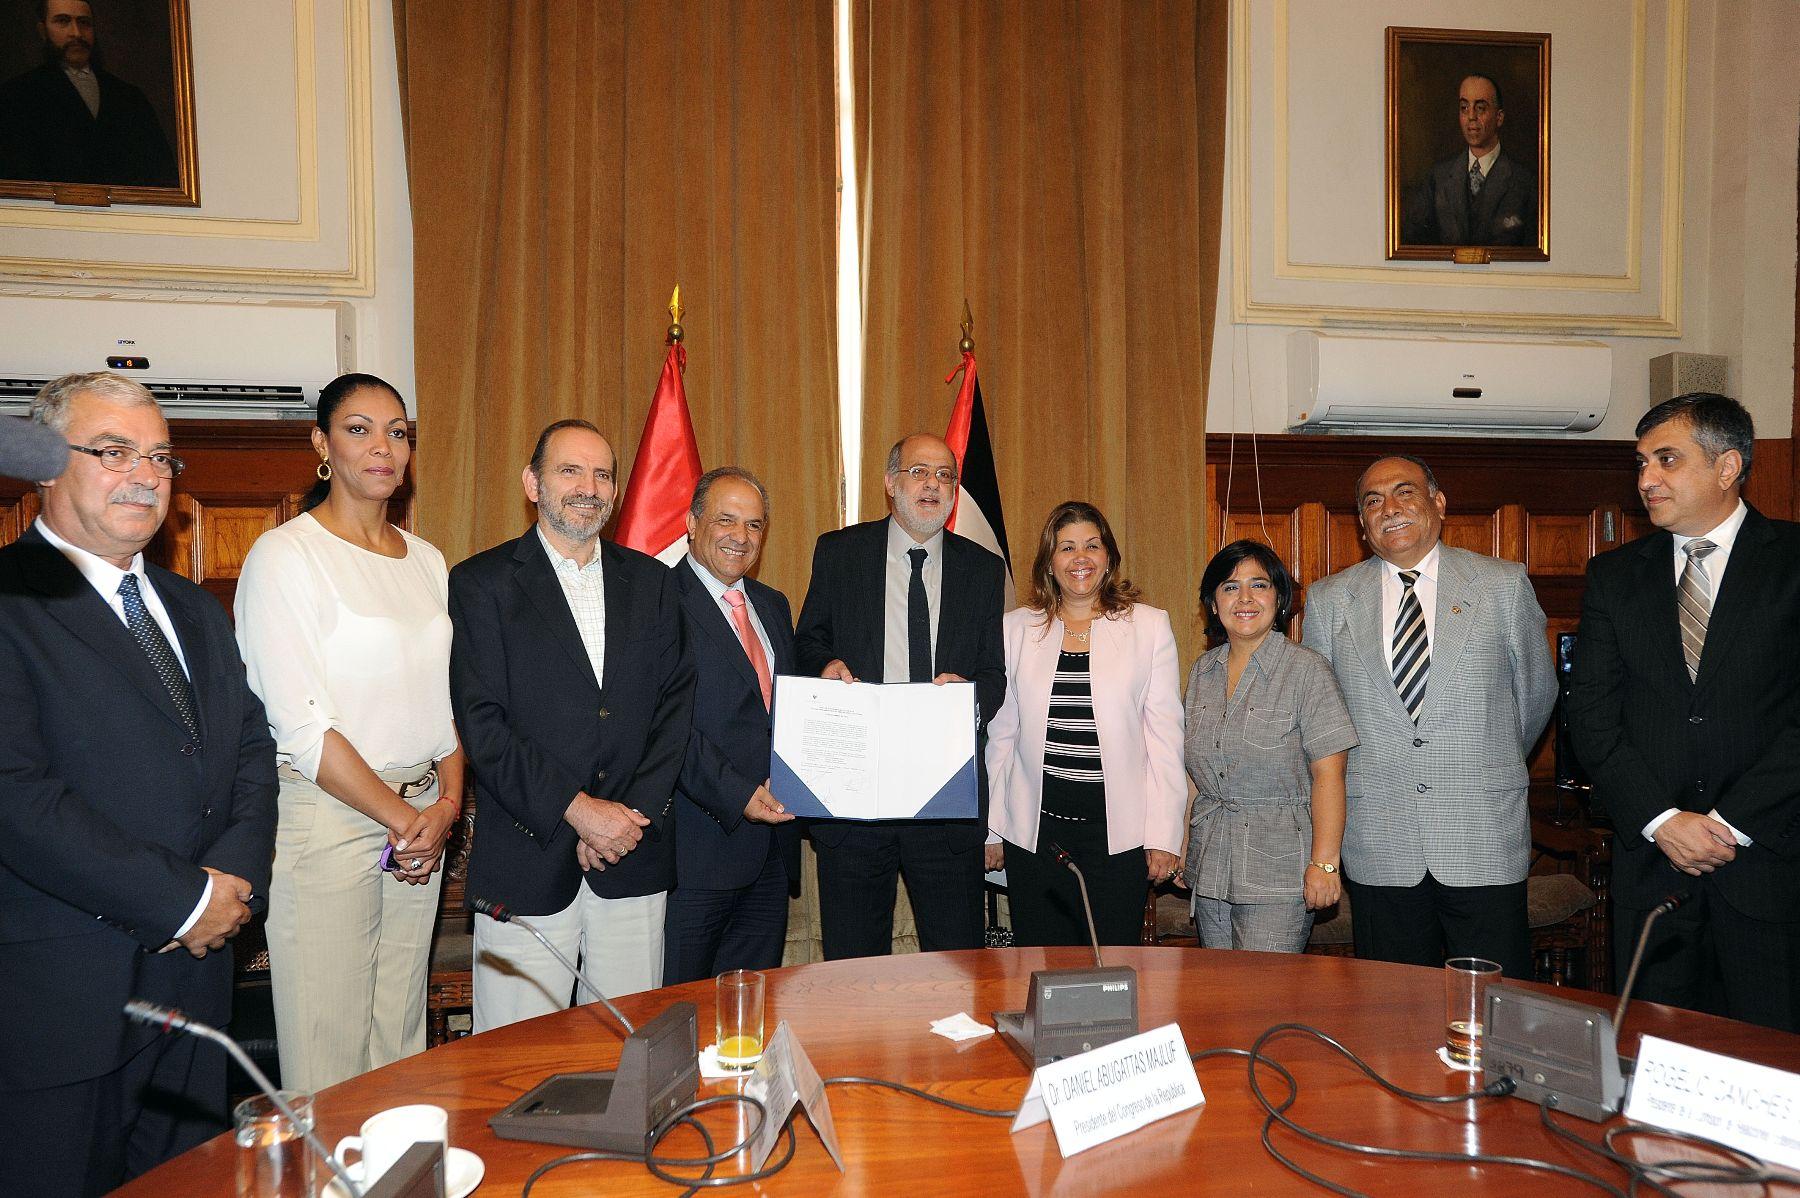 Fue instalada hoy la Liga Parlamentaria de Amistad Perú-Palestina.   Foto: ANDINA/CDR.